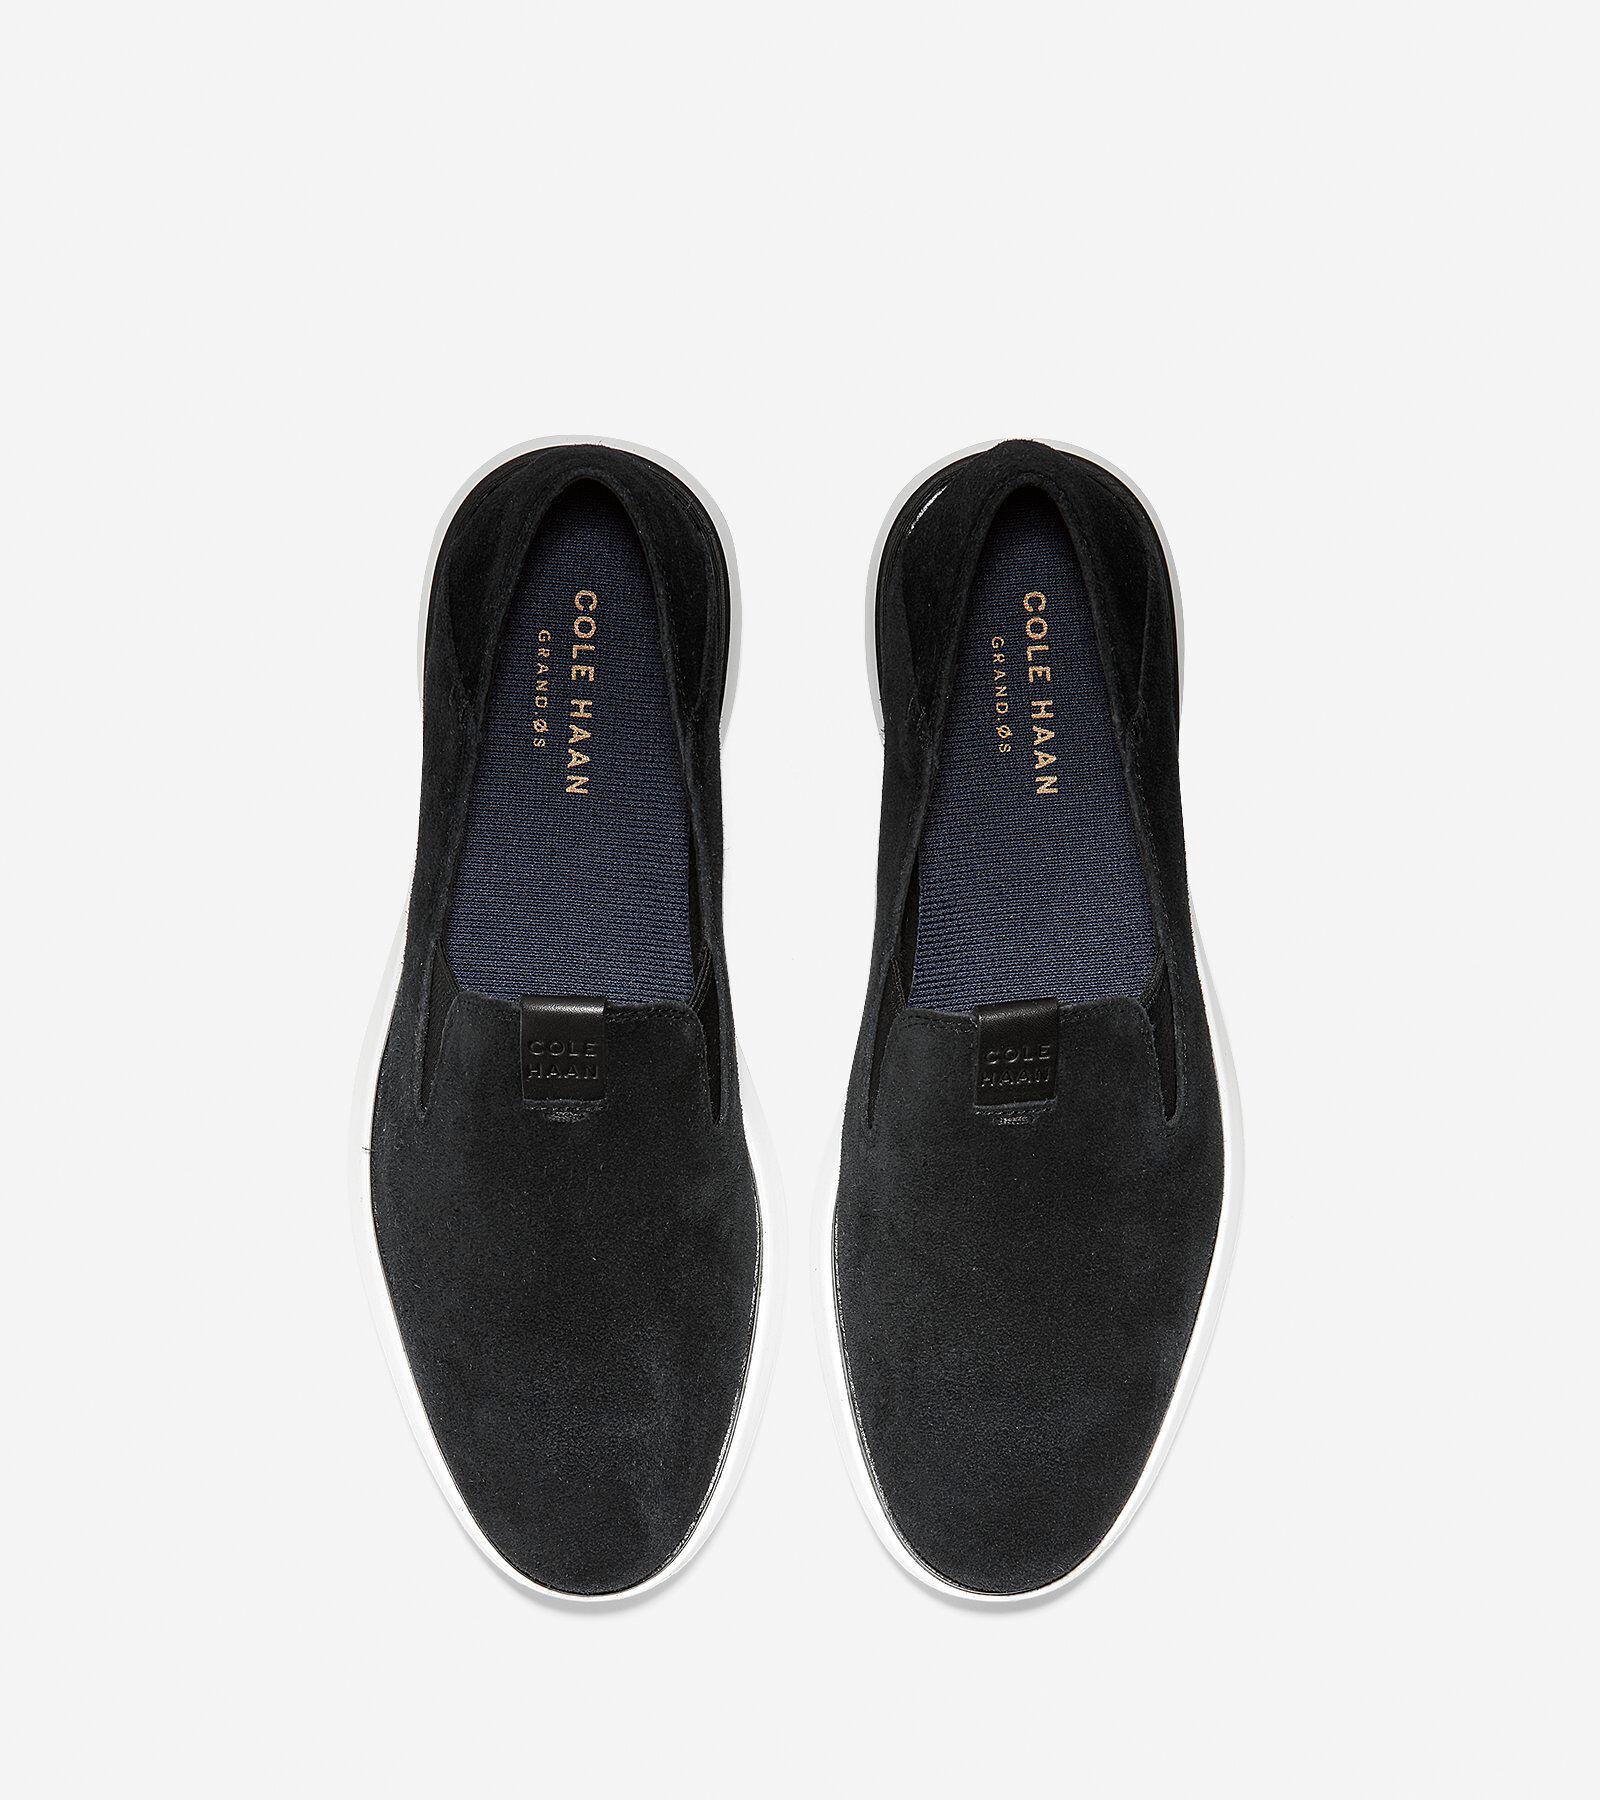 Men's Cole Haan Grand Horizon Slip On Loafer, Size: 9 M, Black/Optic White